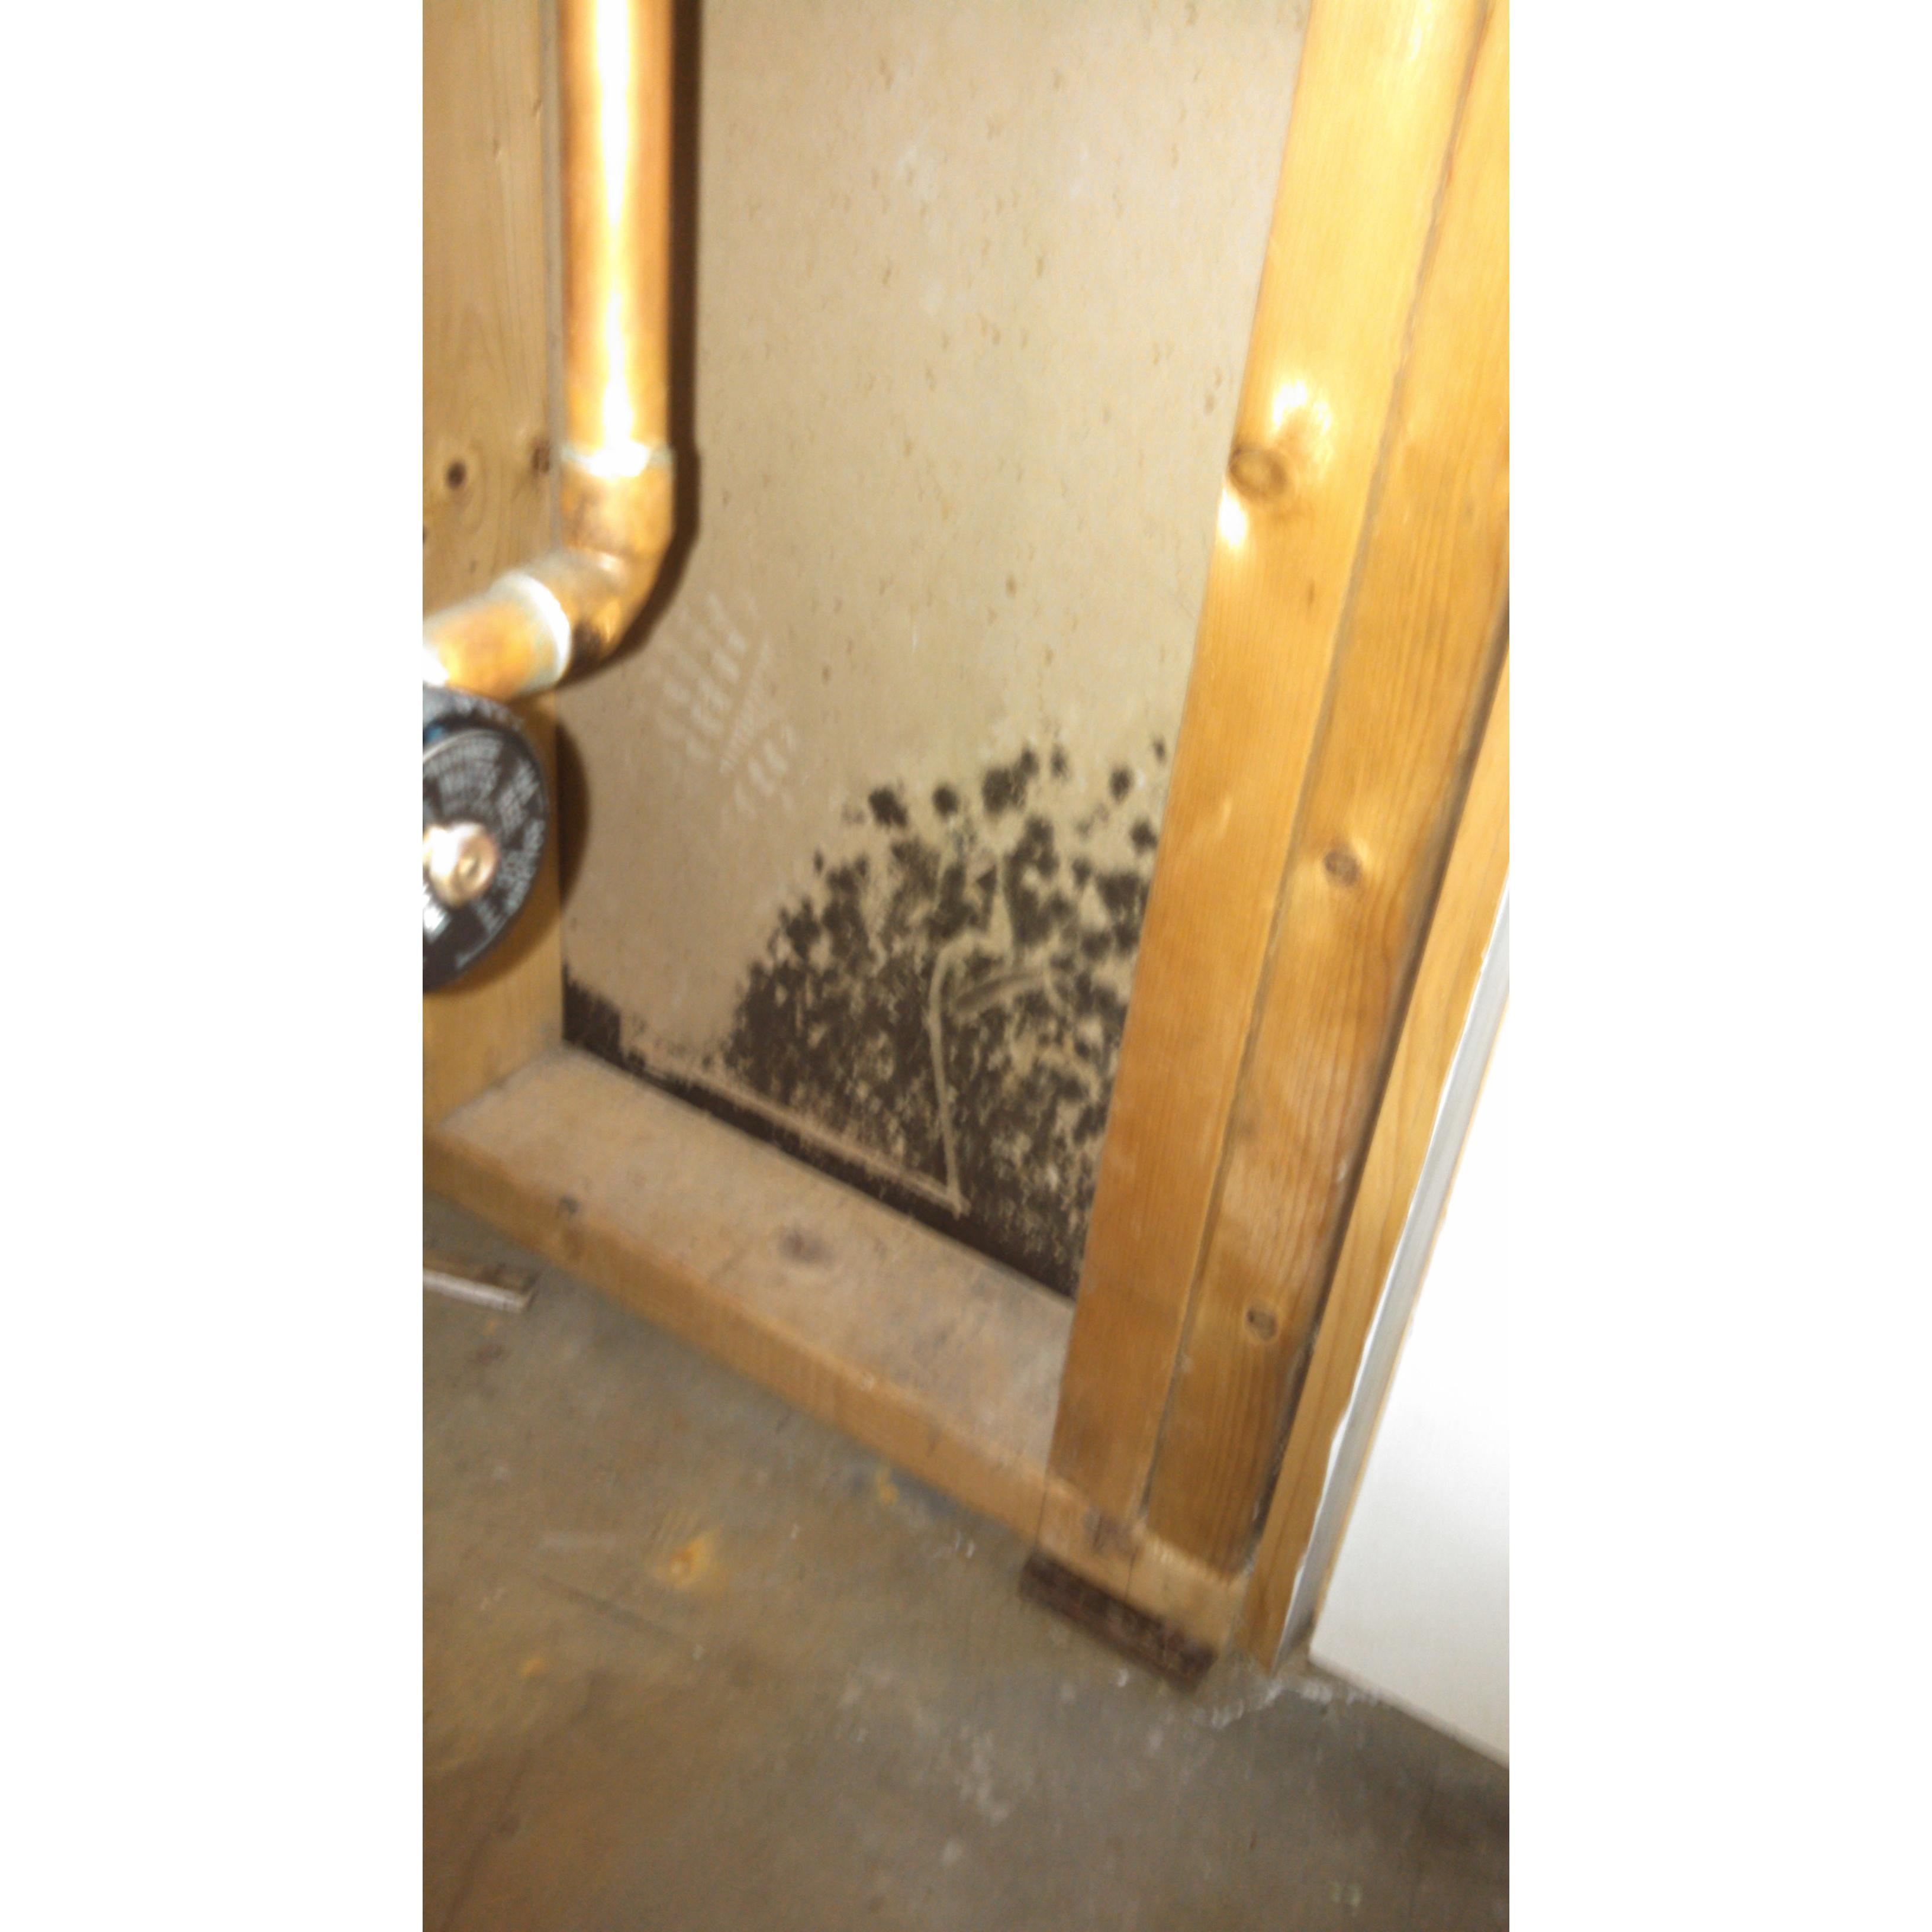 CLS Mold Testing, LLC - West Warwick, RI - Debris & Waste Removal